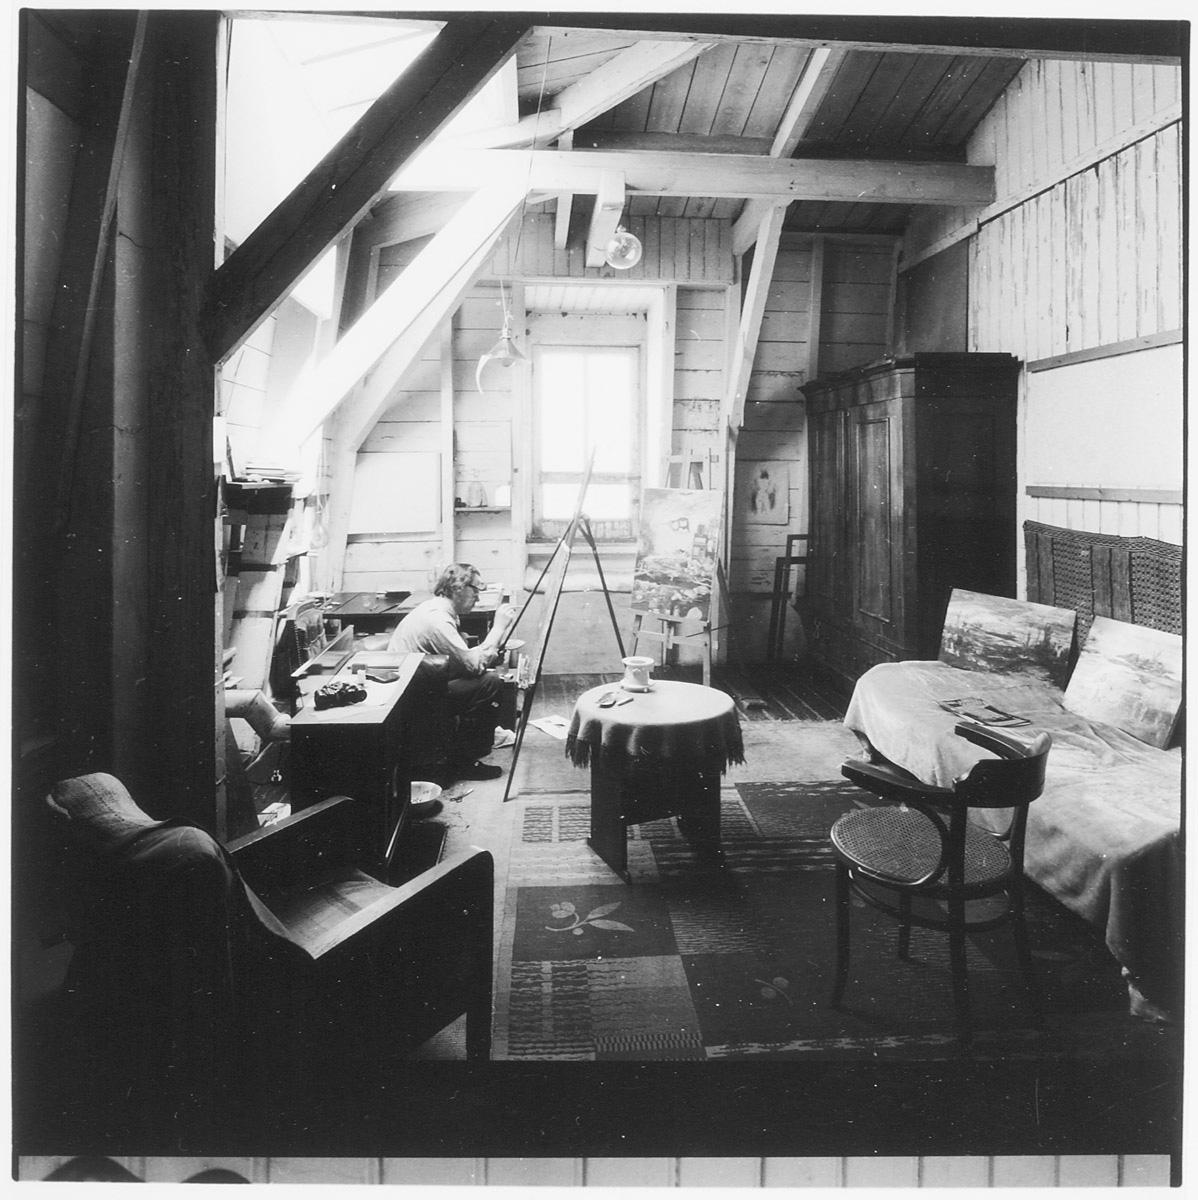 Melle schilder   Melle in atelier Amsteldijk 62, film op fotopapier